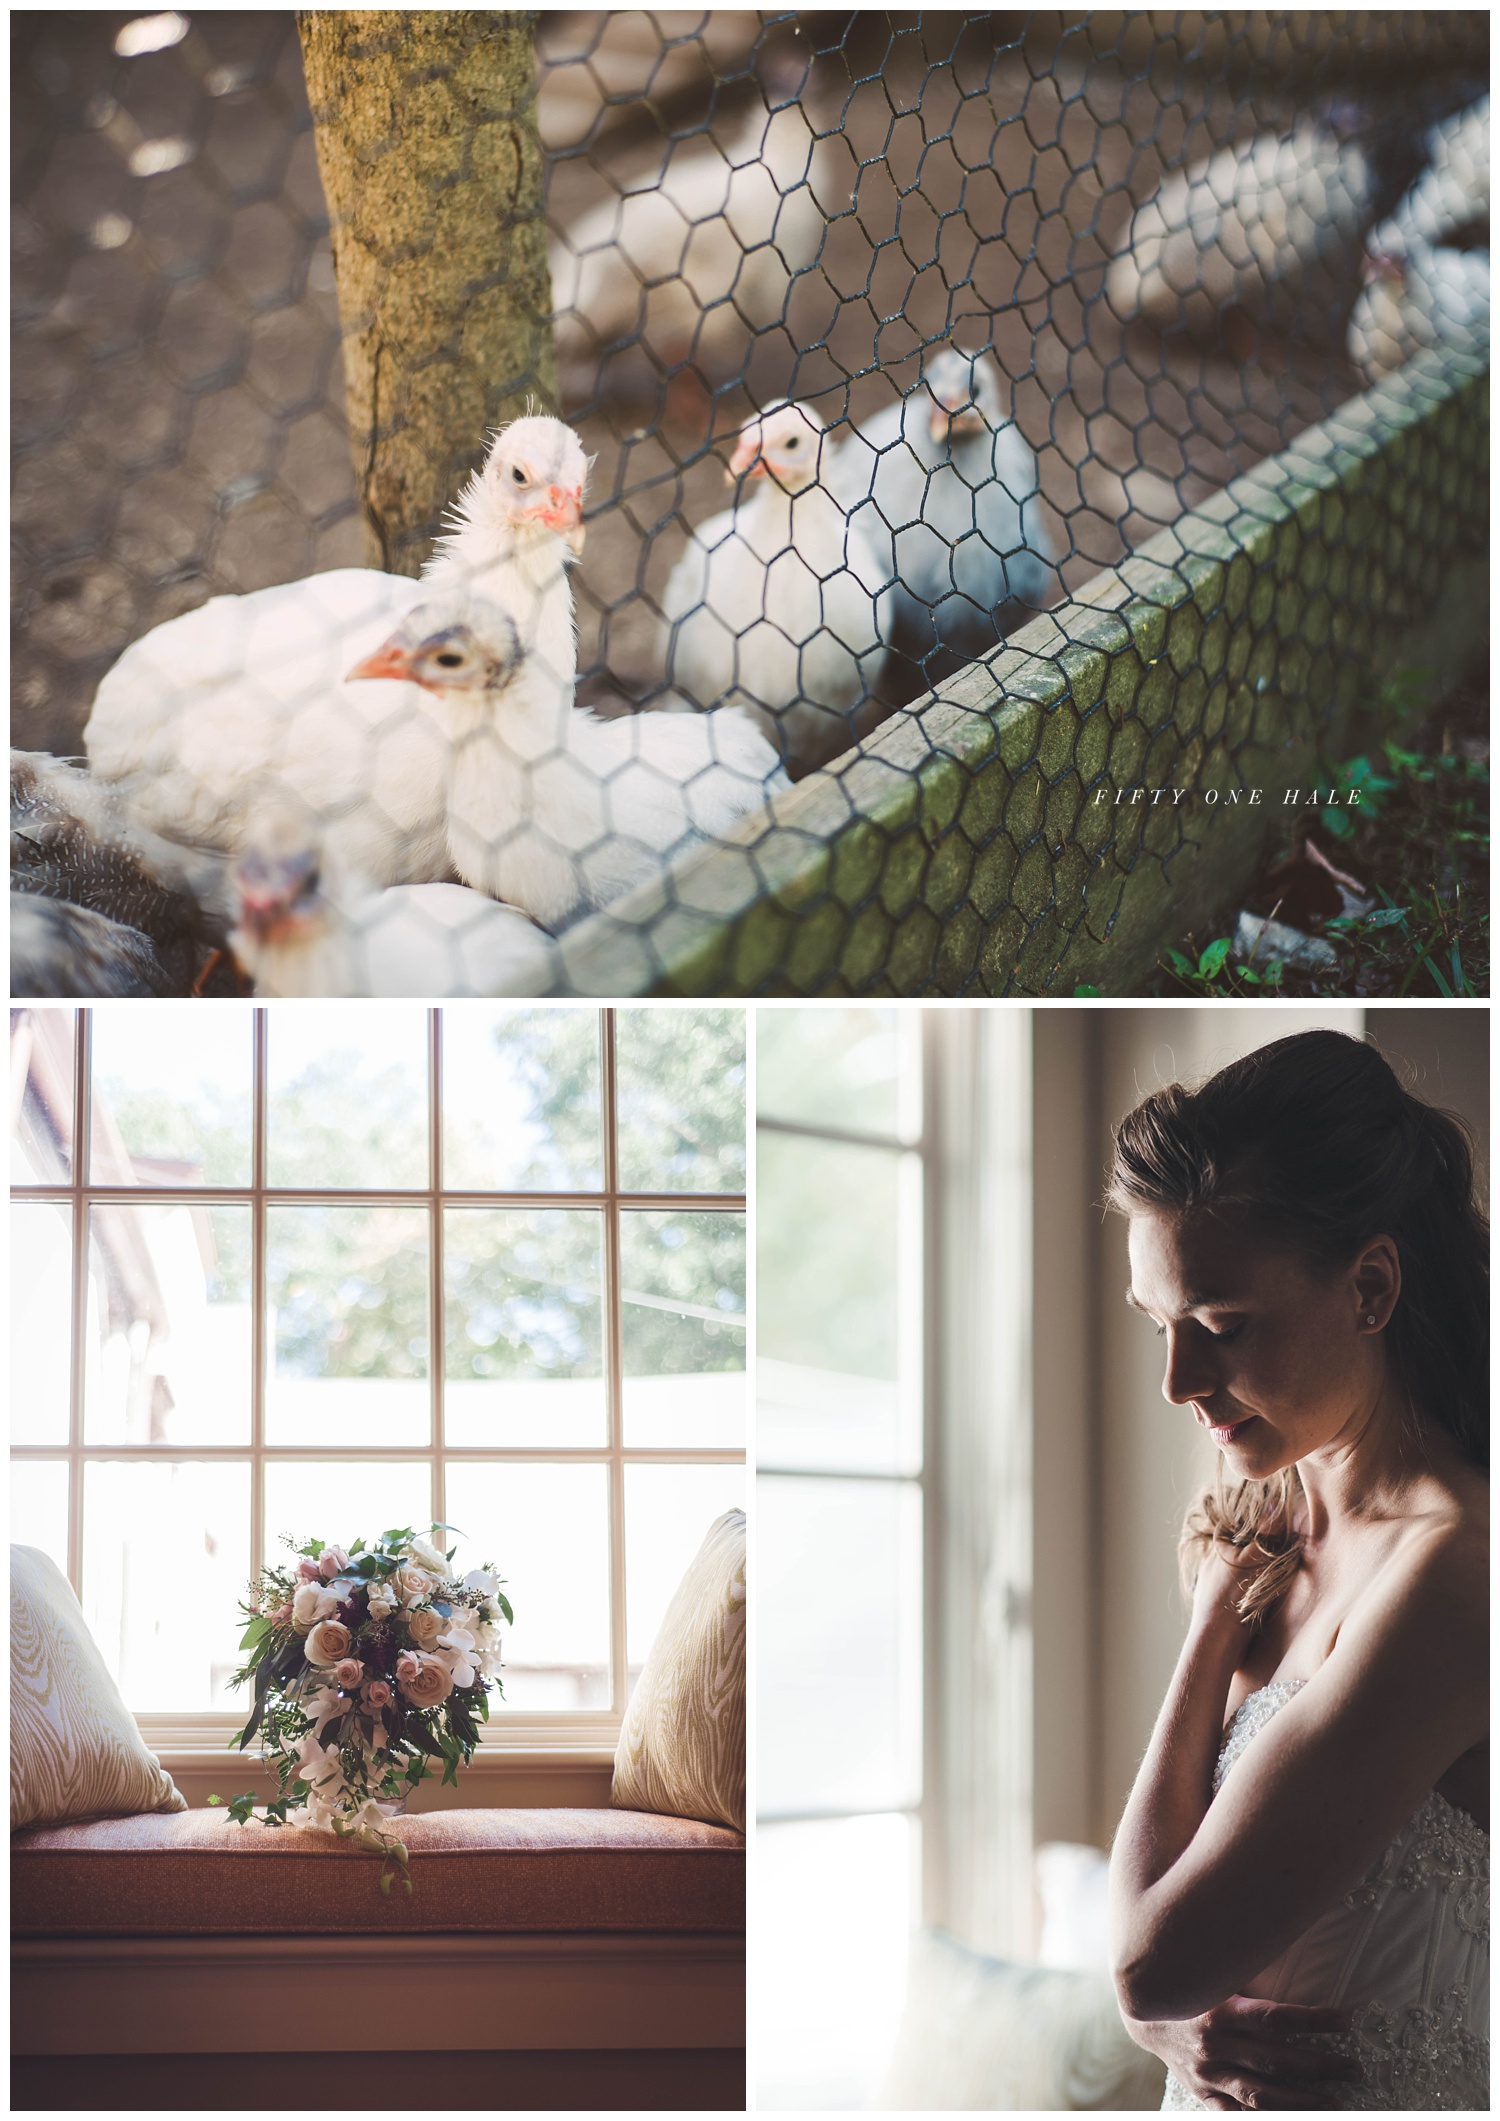 farm_wedding_photographer_boston_0001.jpg